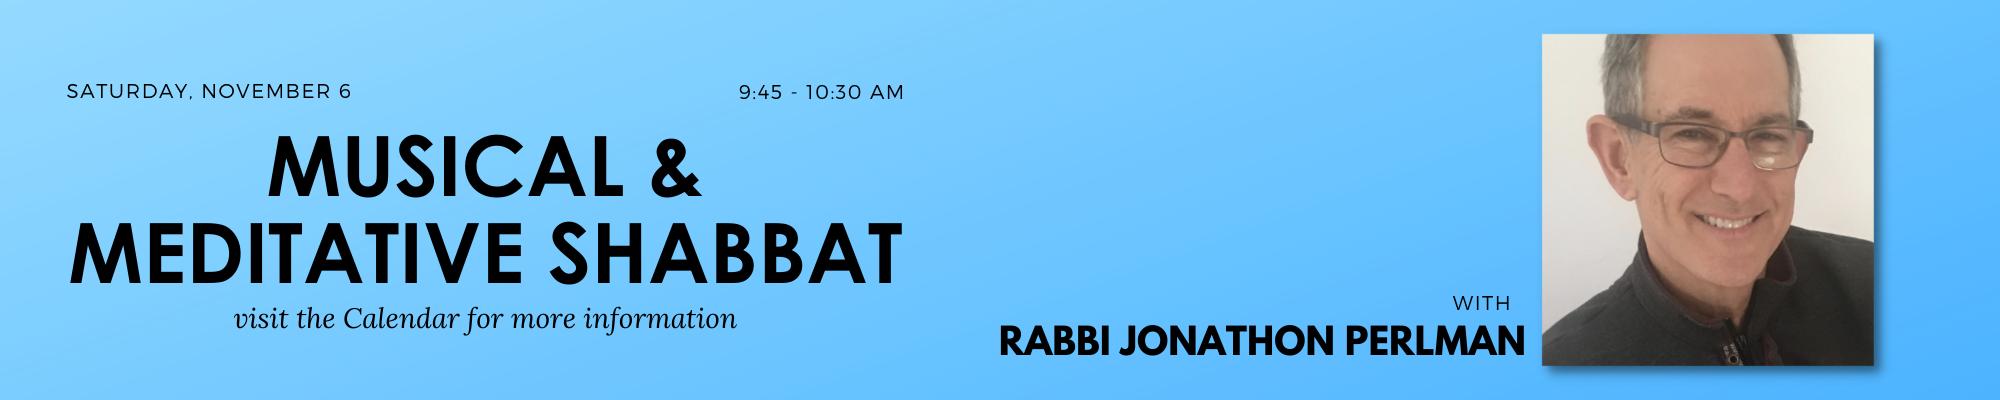 "</a>                                                                                                                                                                                       <span class=""slider_description"">Join Rabbi Jonathan Perlman, a long-time member of Adath Israel, for a musical and meditative Shabbat morning.</span>                                                                                     <a href=""https://www.adath-israel.org/event/meditativeshabbat"" class=""slider_link""                             target="""">                             Learn more and register                            </a>"